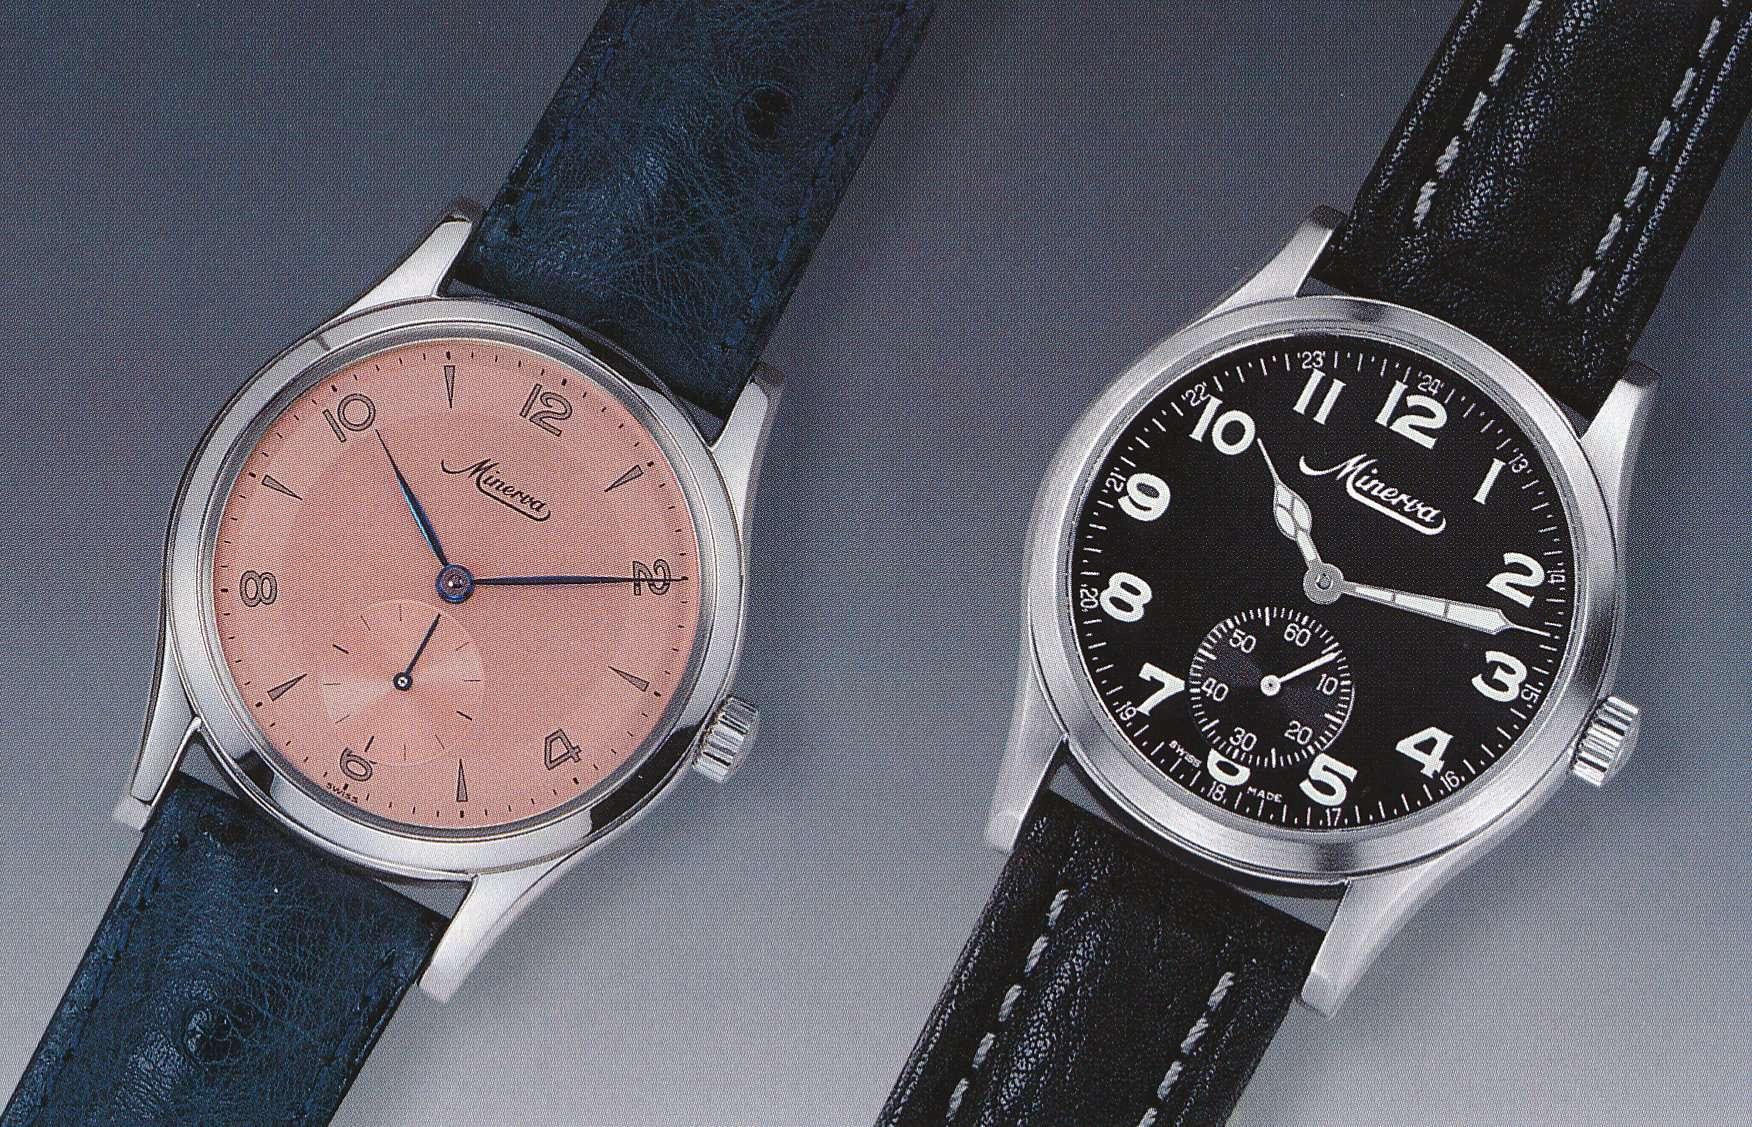 Minerva Armbanduhren Kaliber 48 von 1998